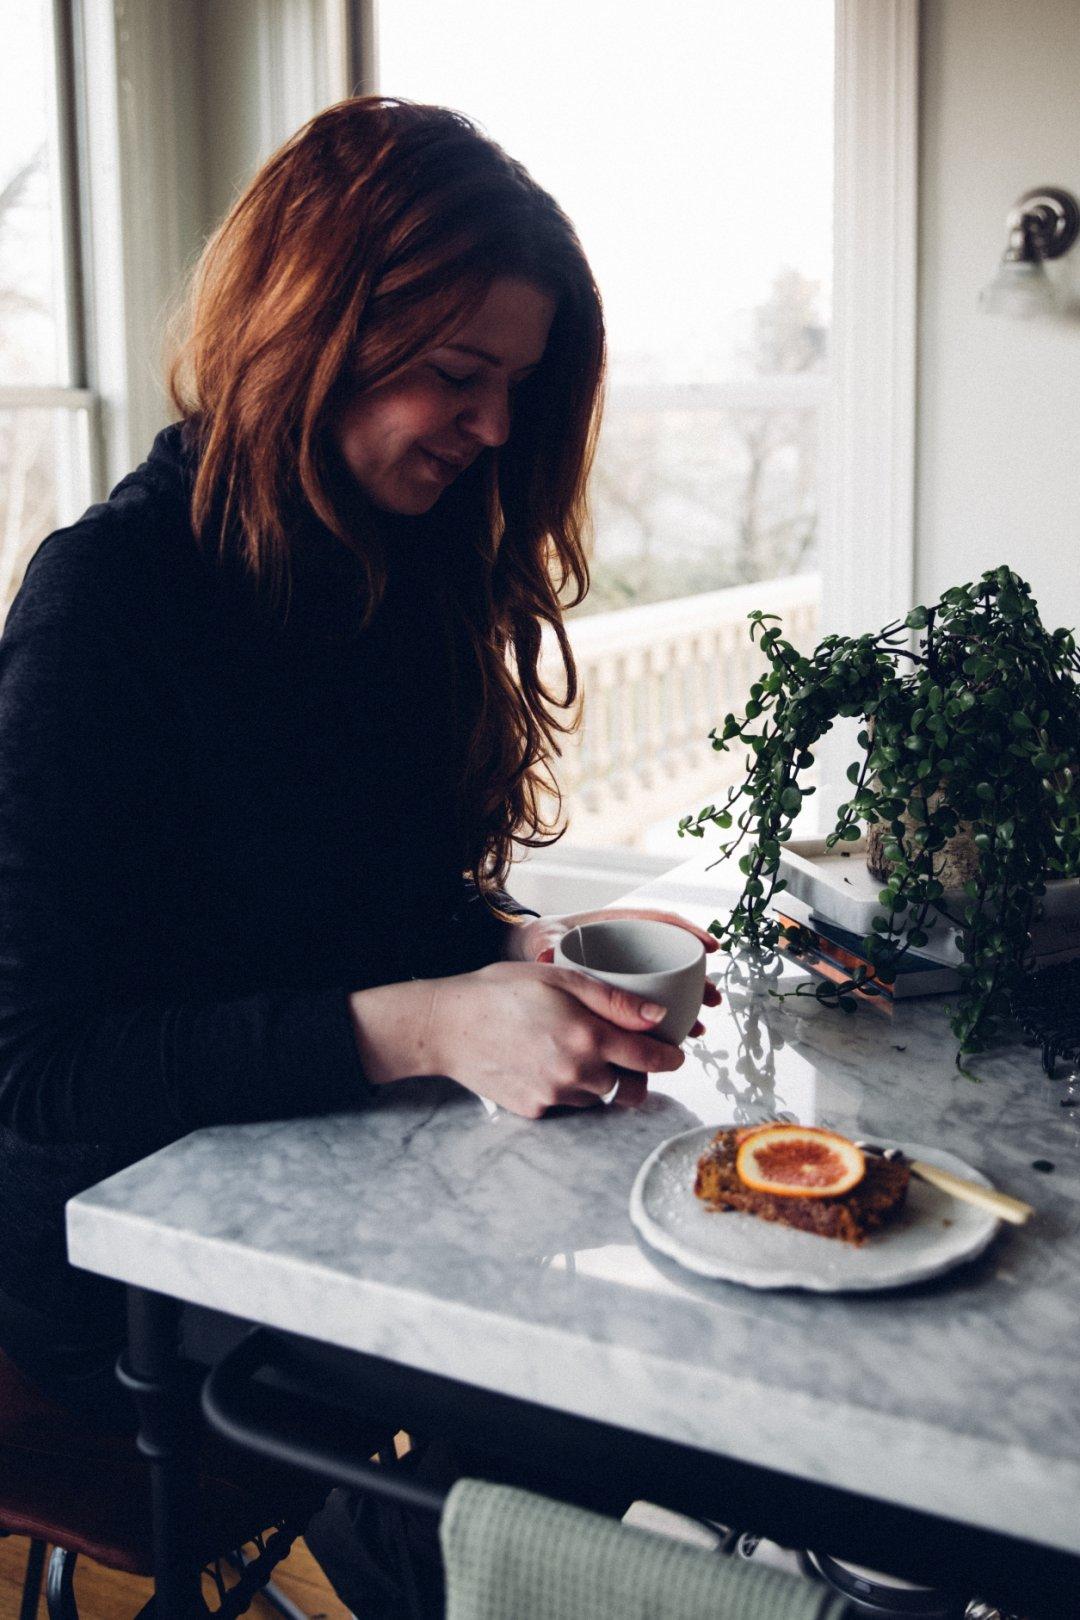 Christiann sitting at her kitchen island drinking tea